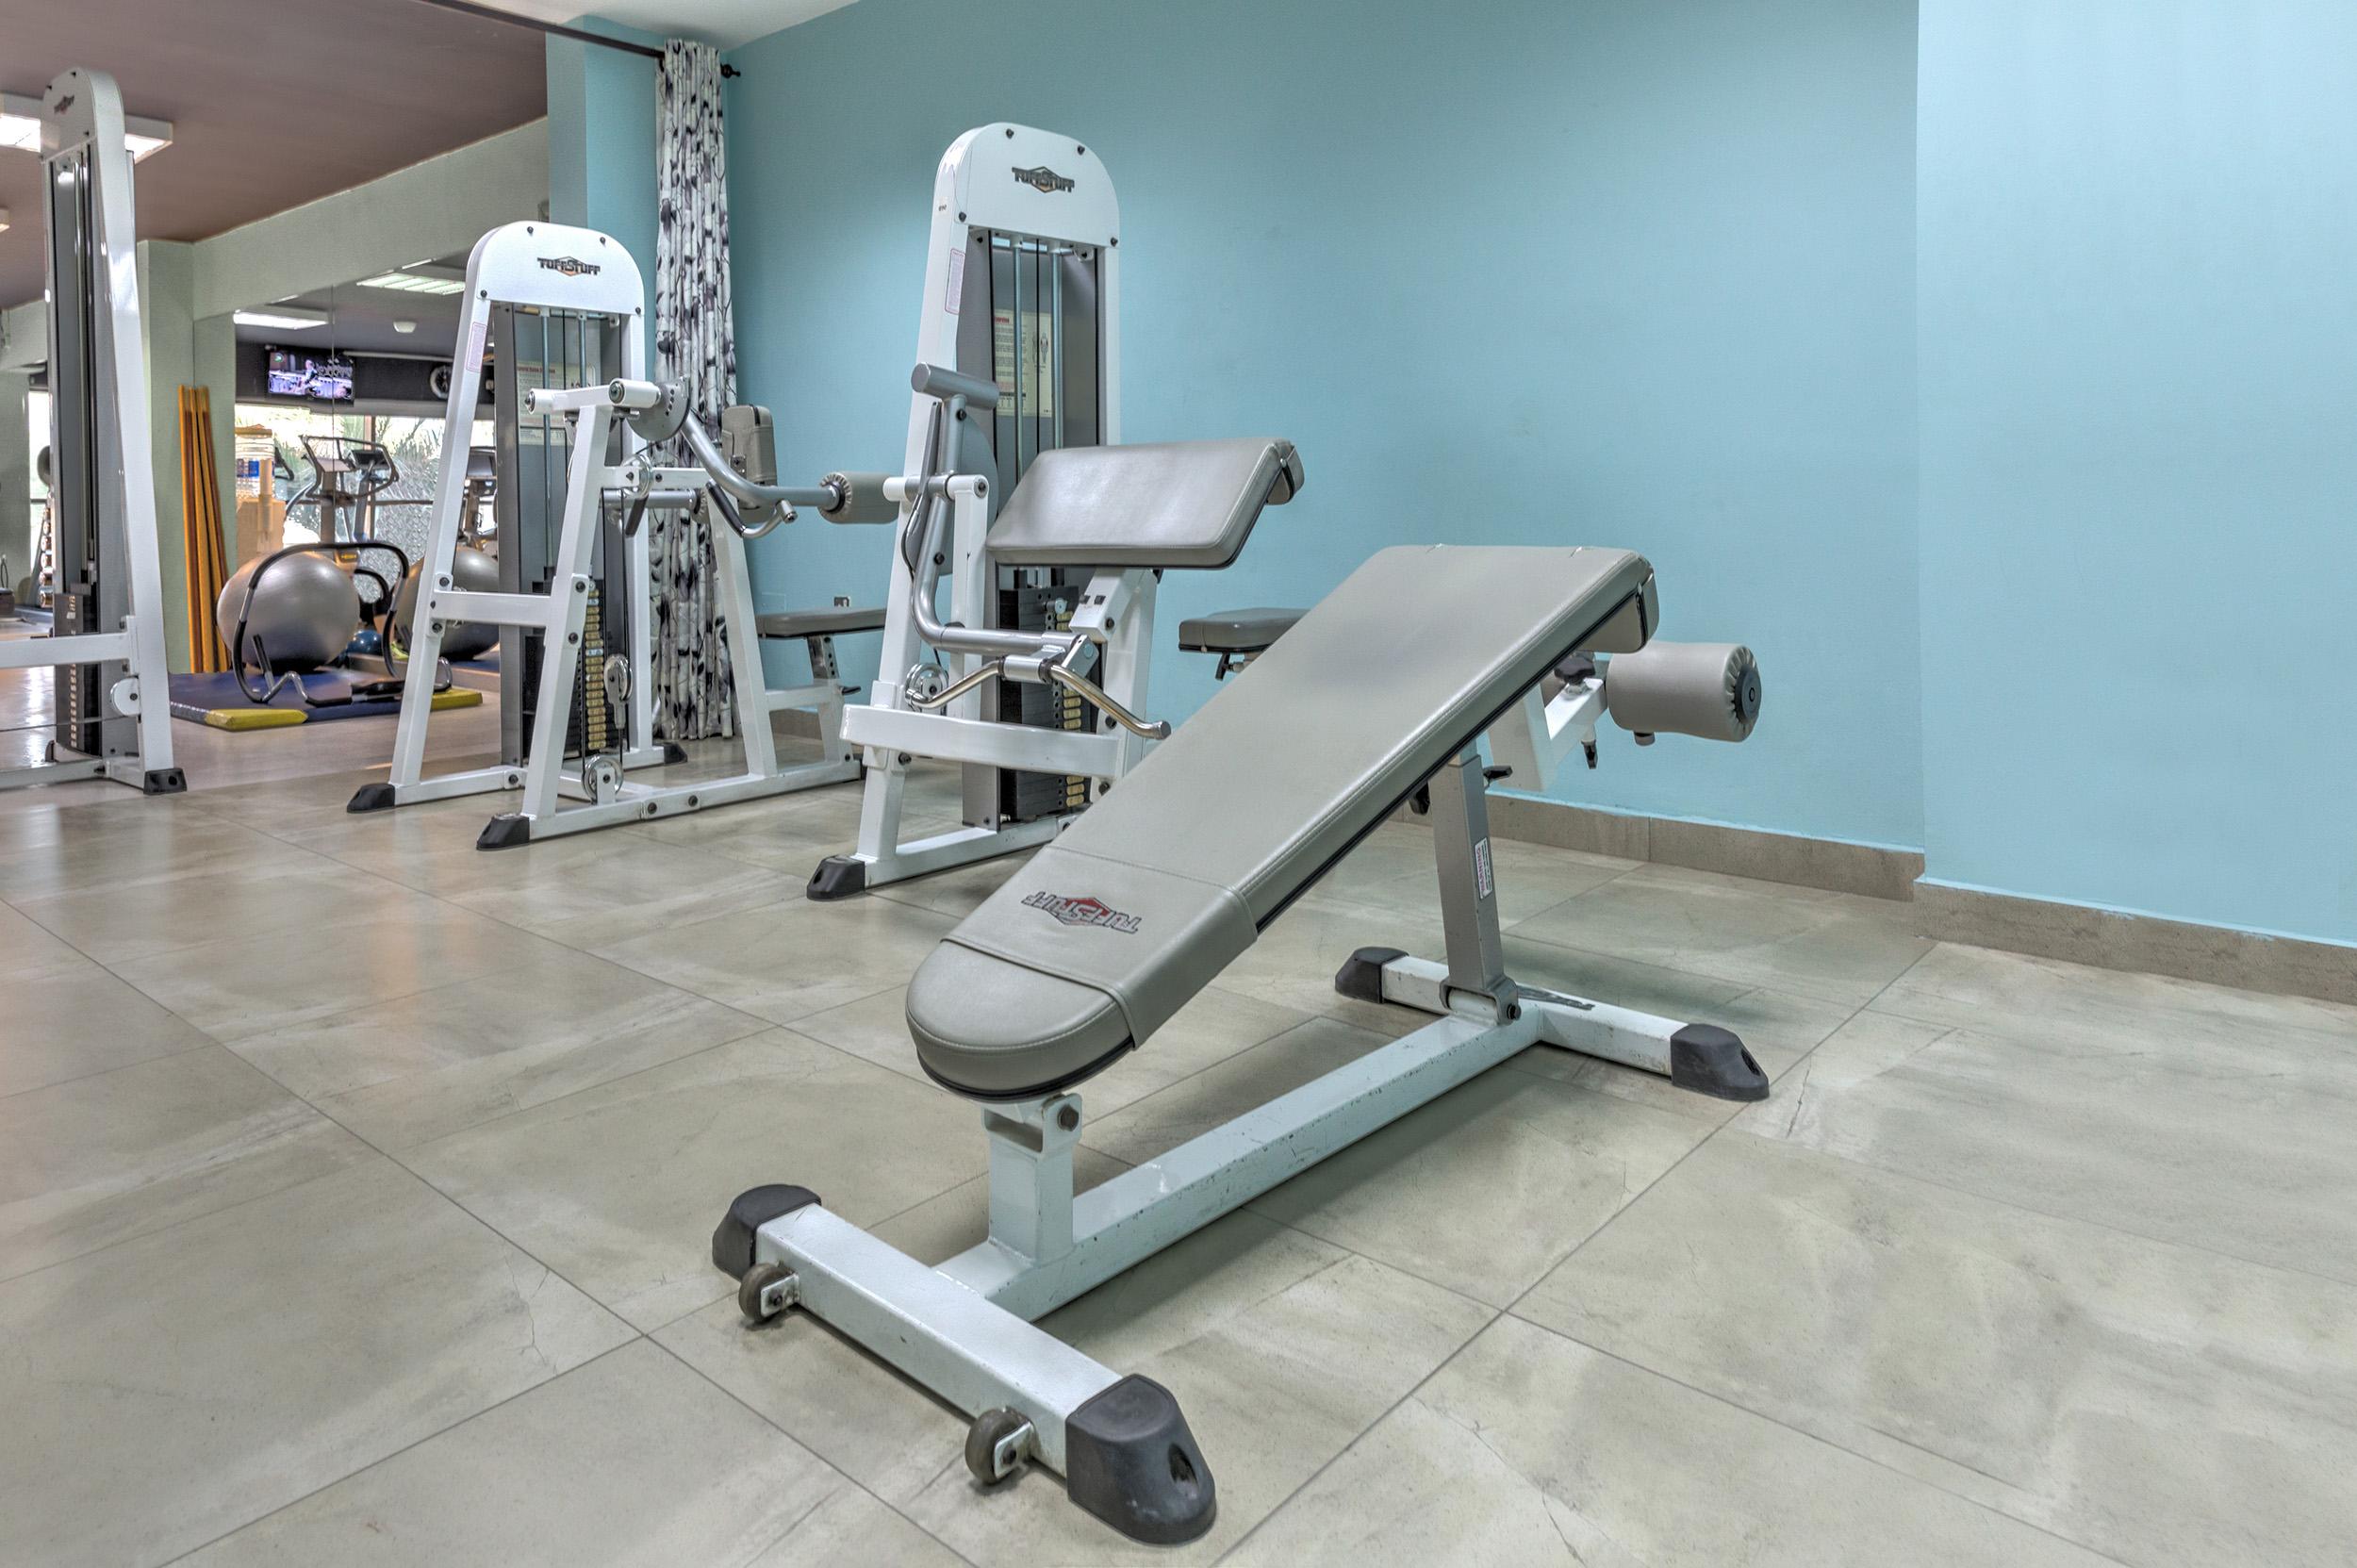 ladies-gym-1-4